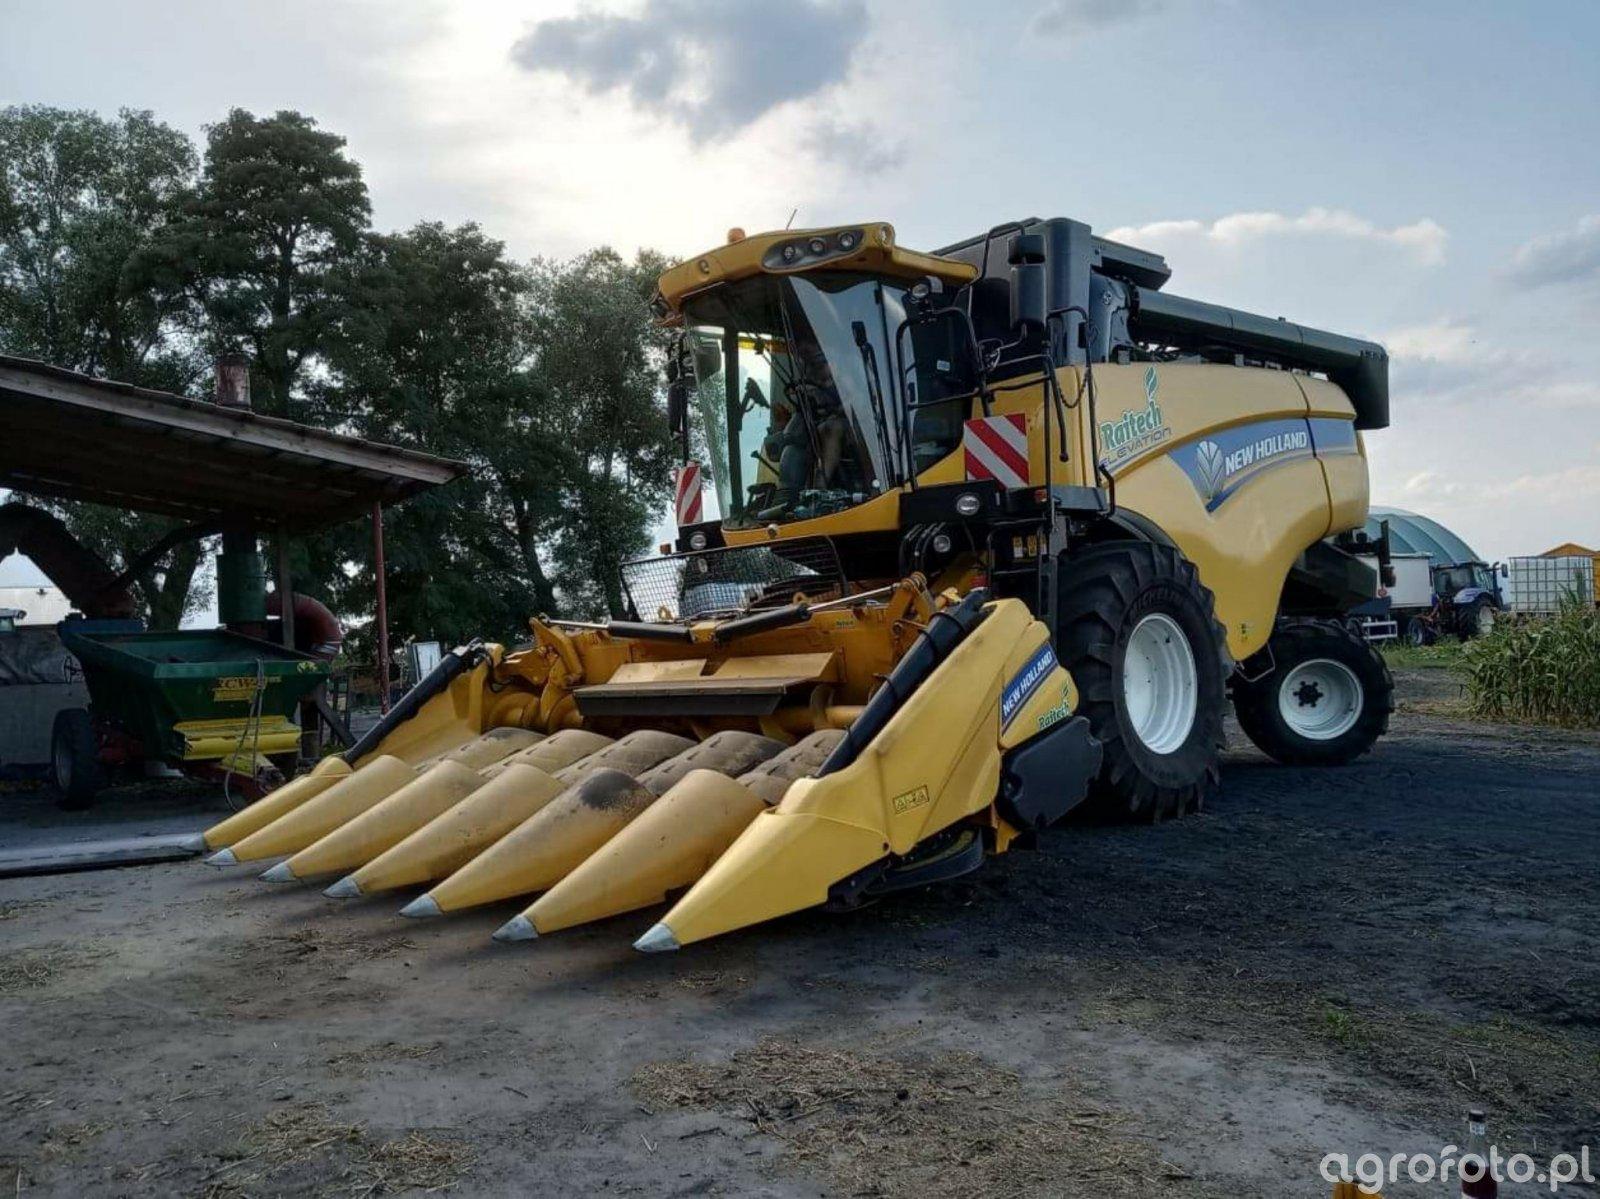 New Holland 5080